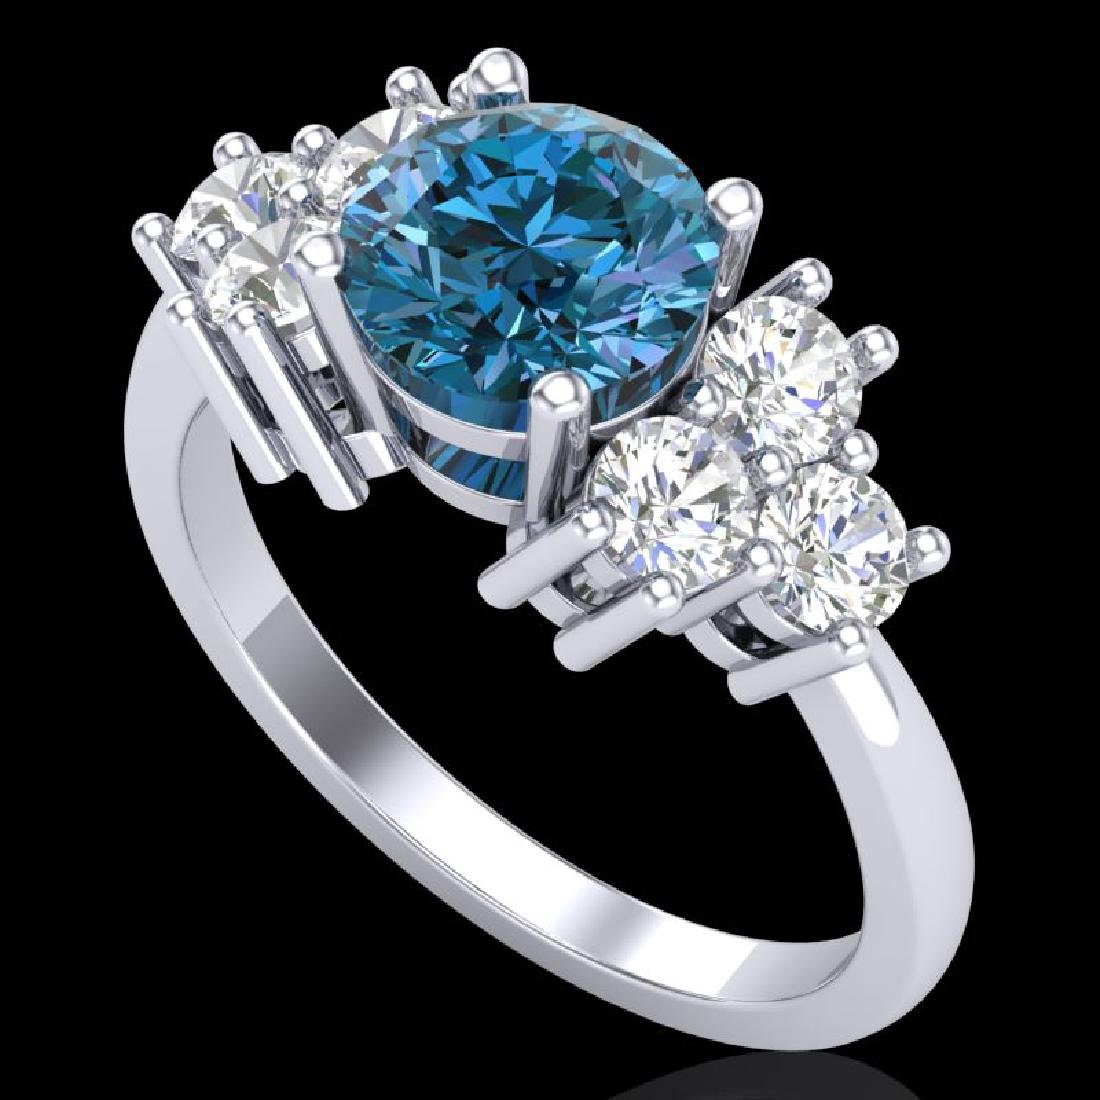 2.1 CTW Intense Blue Diamond Solitaire Engagment